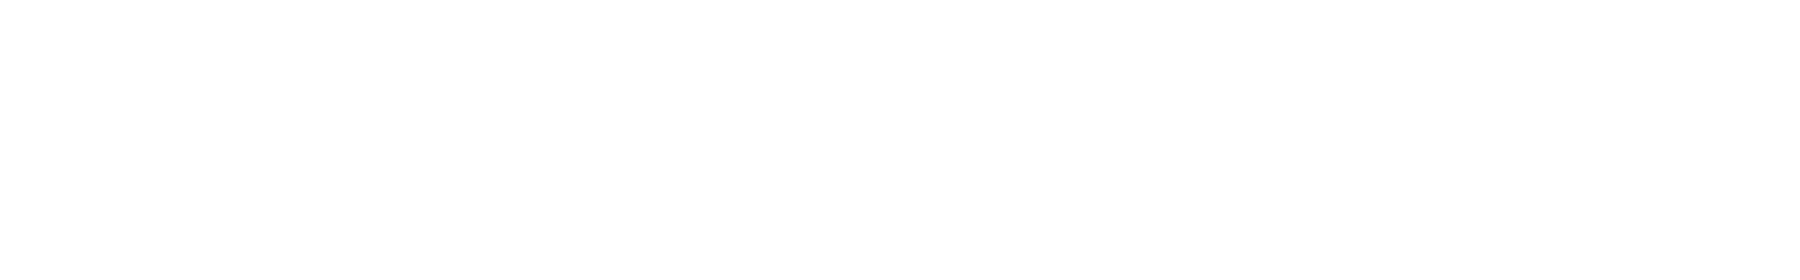 shs ch musicloop 127 epiano2 cm